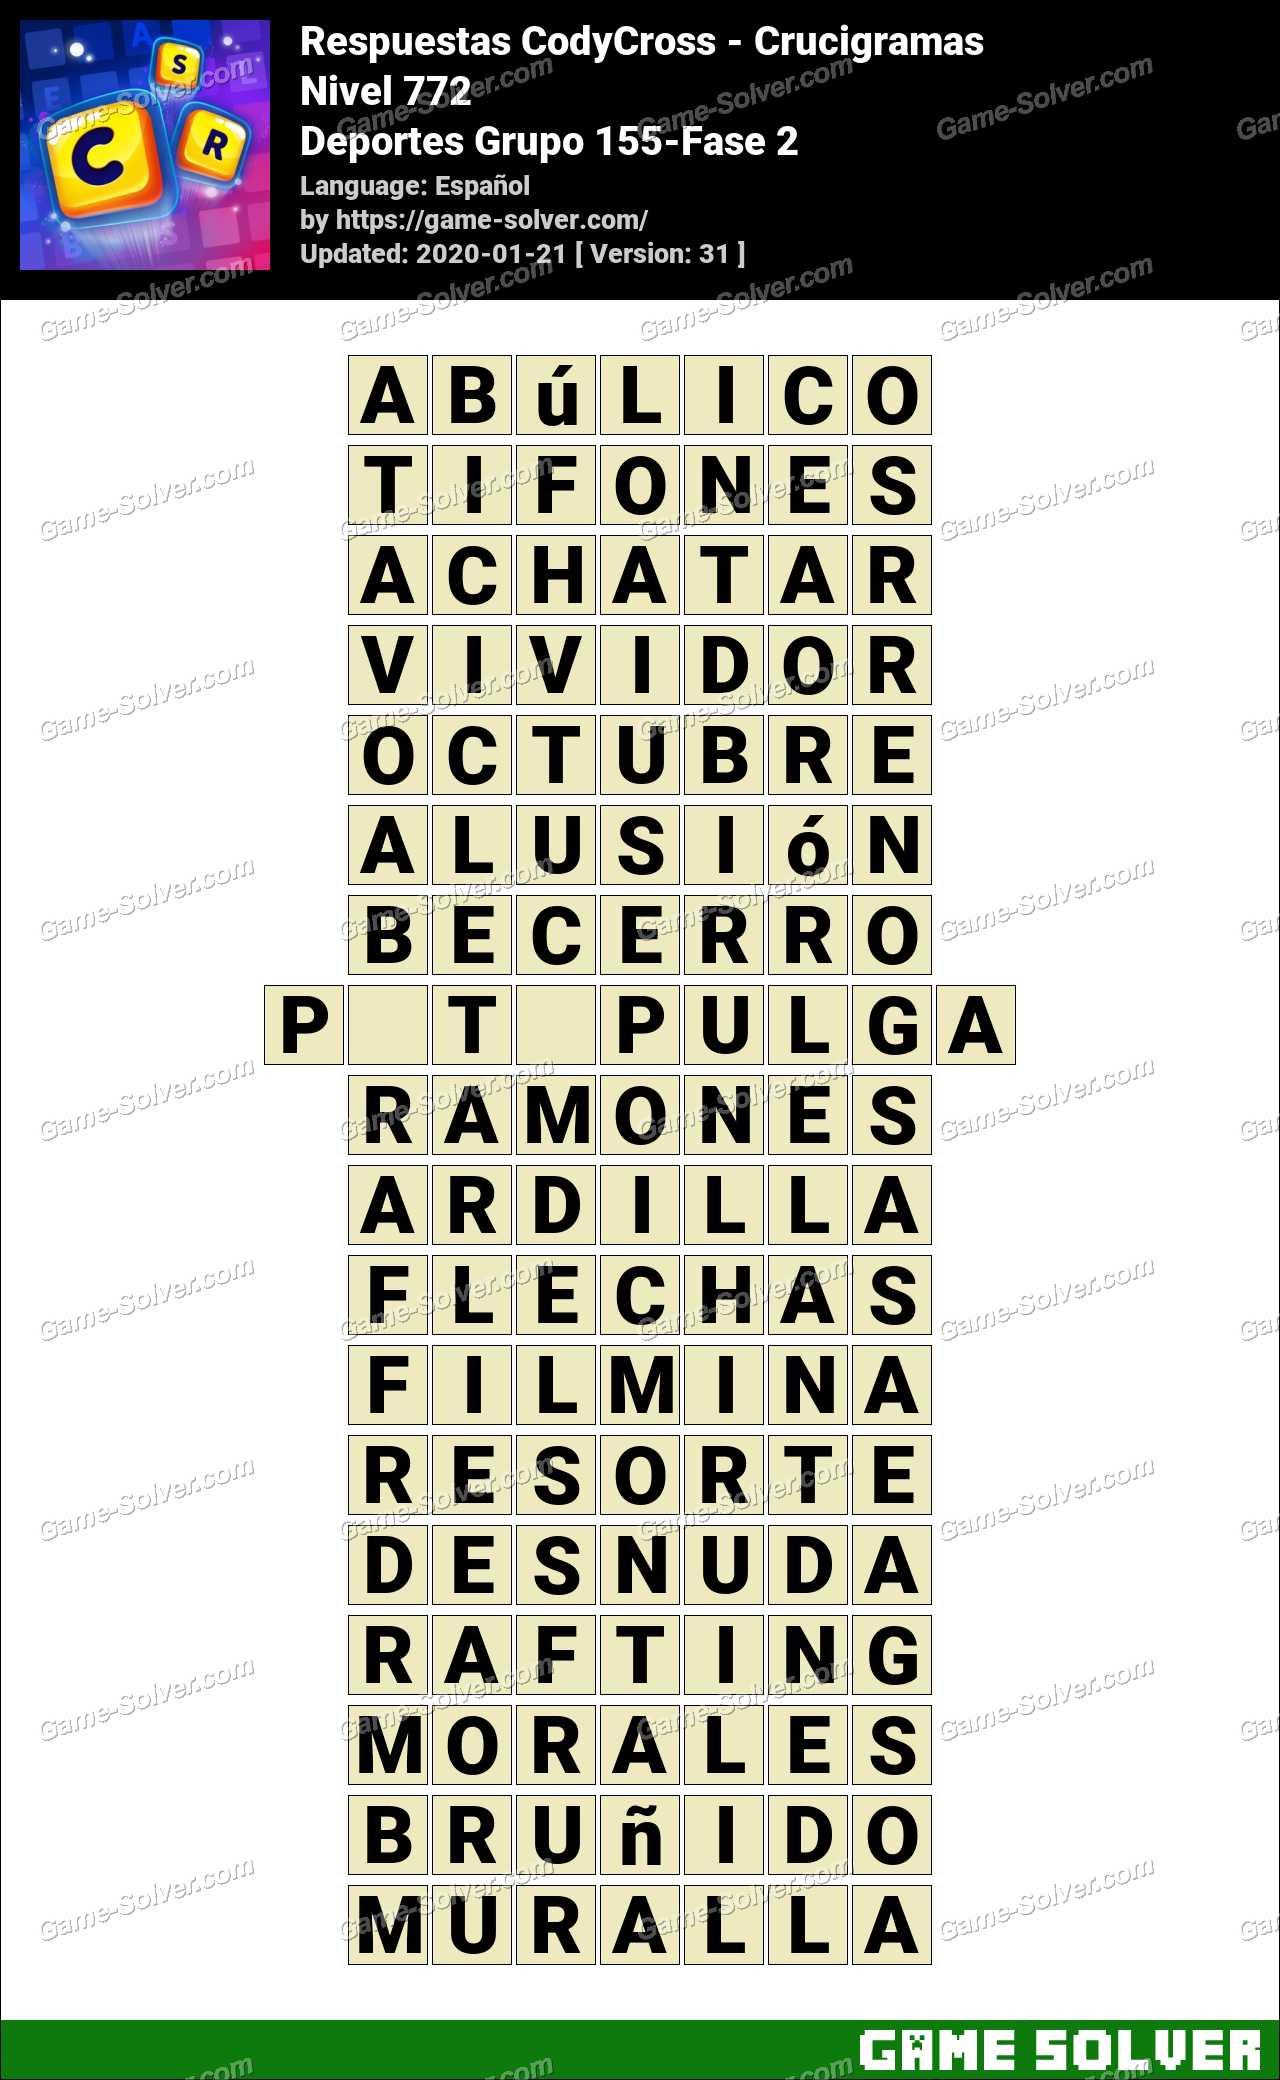 Respuestas CodyCross Deportes Grupo 155-Fase 2